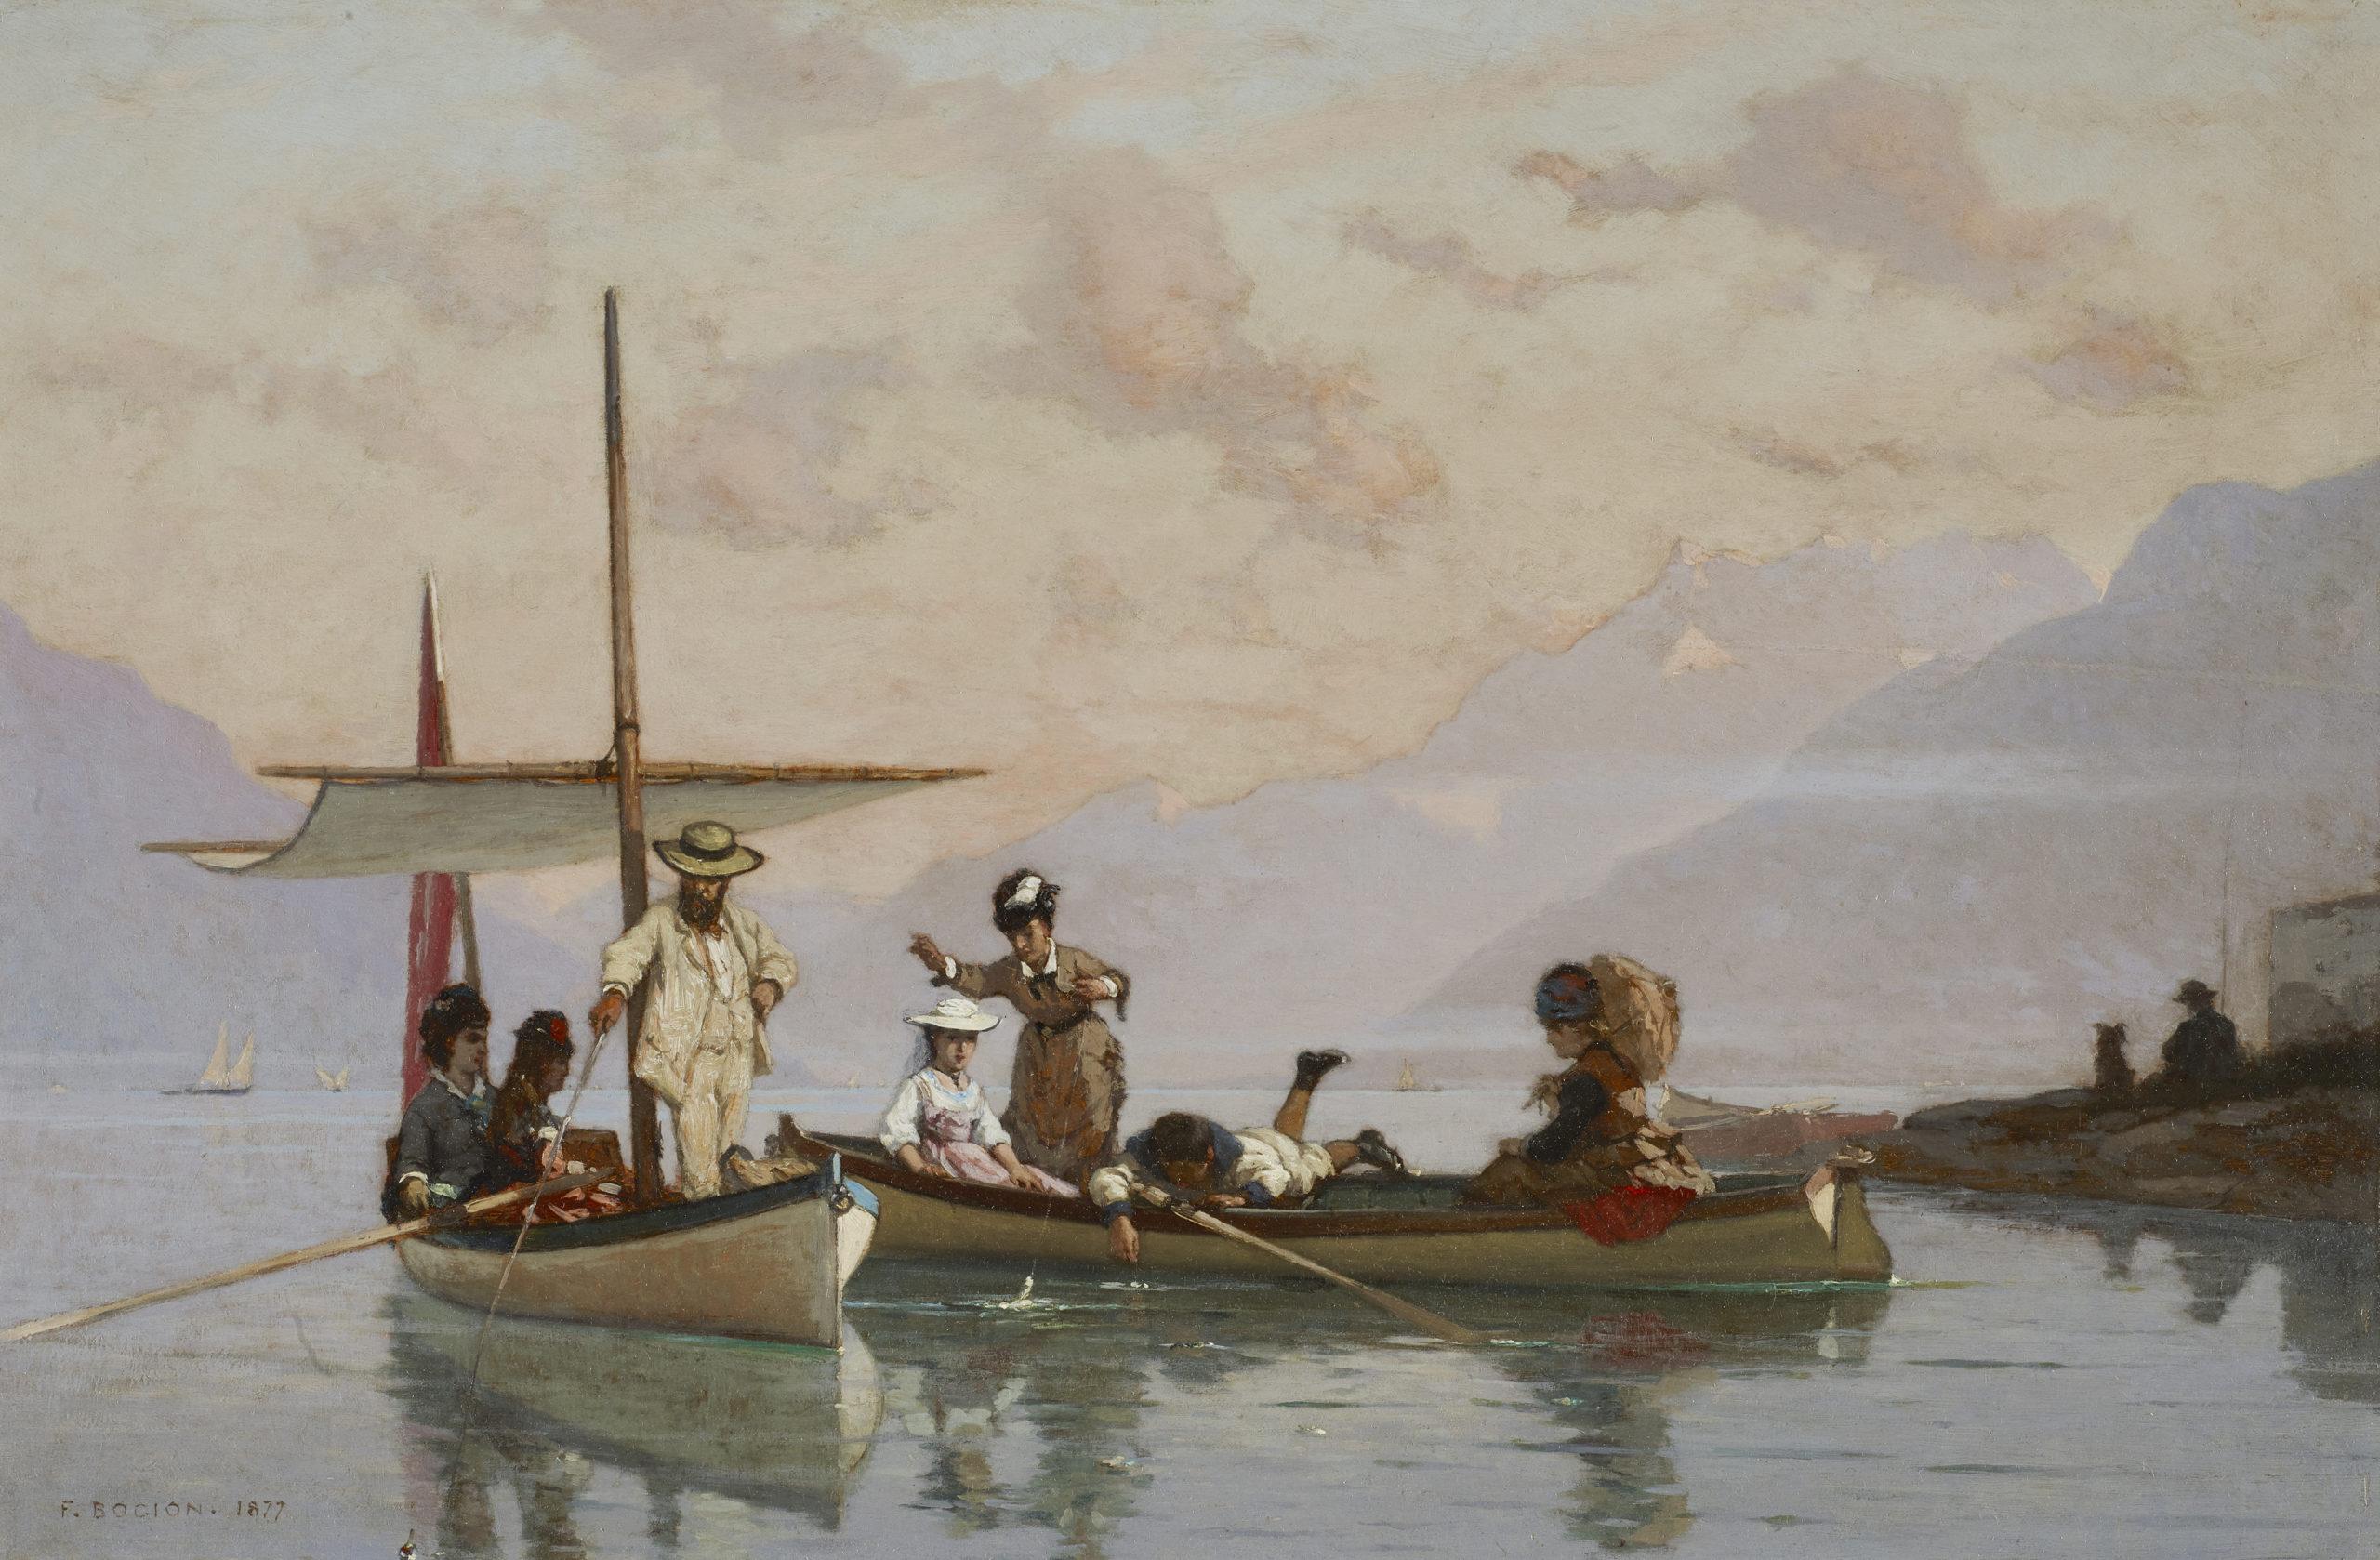 François Bocion, Bocion et sa famille à la pêche (Bocion e la sua famiglia in una partita di pesca), 1877, Losanna, ©Musée cantonal des Beaux-Arts de Lausanne